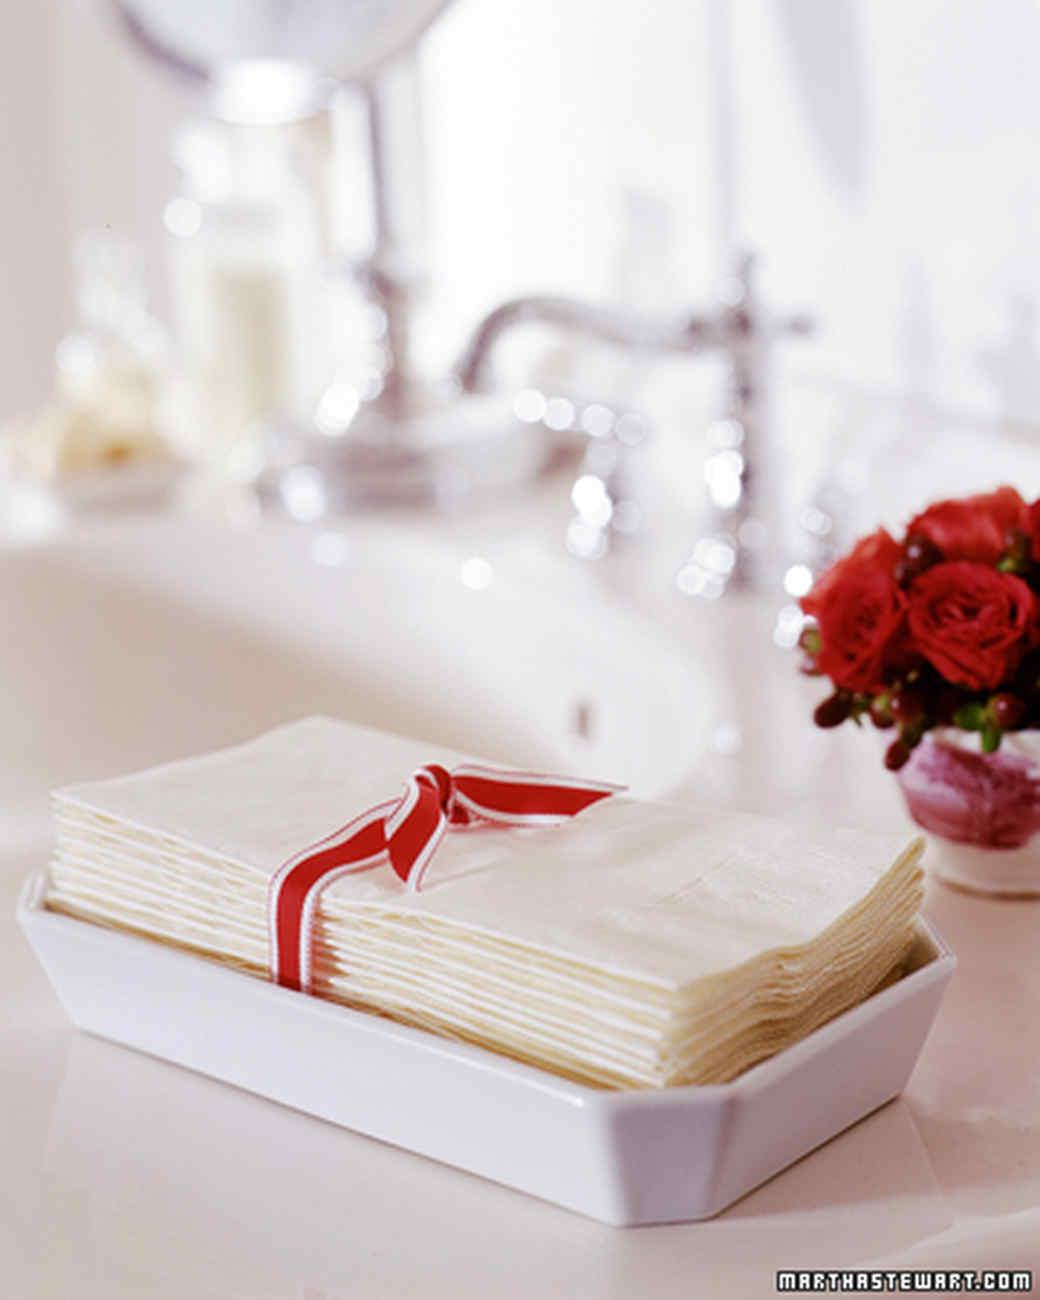 Prepping For Houseguests Martha Stewart - Bathroom paper guest towels for bathroom decor ideas